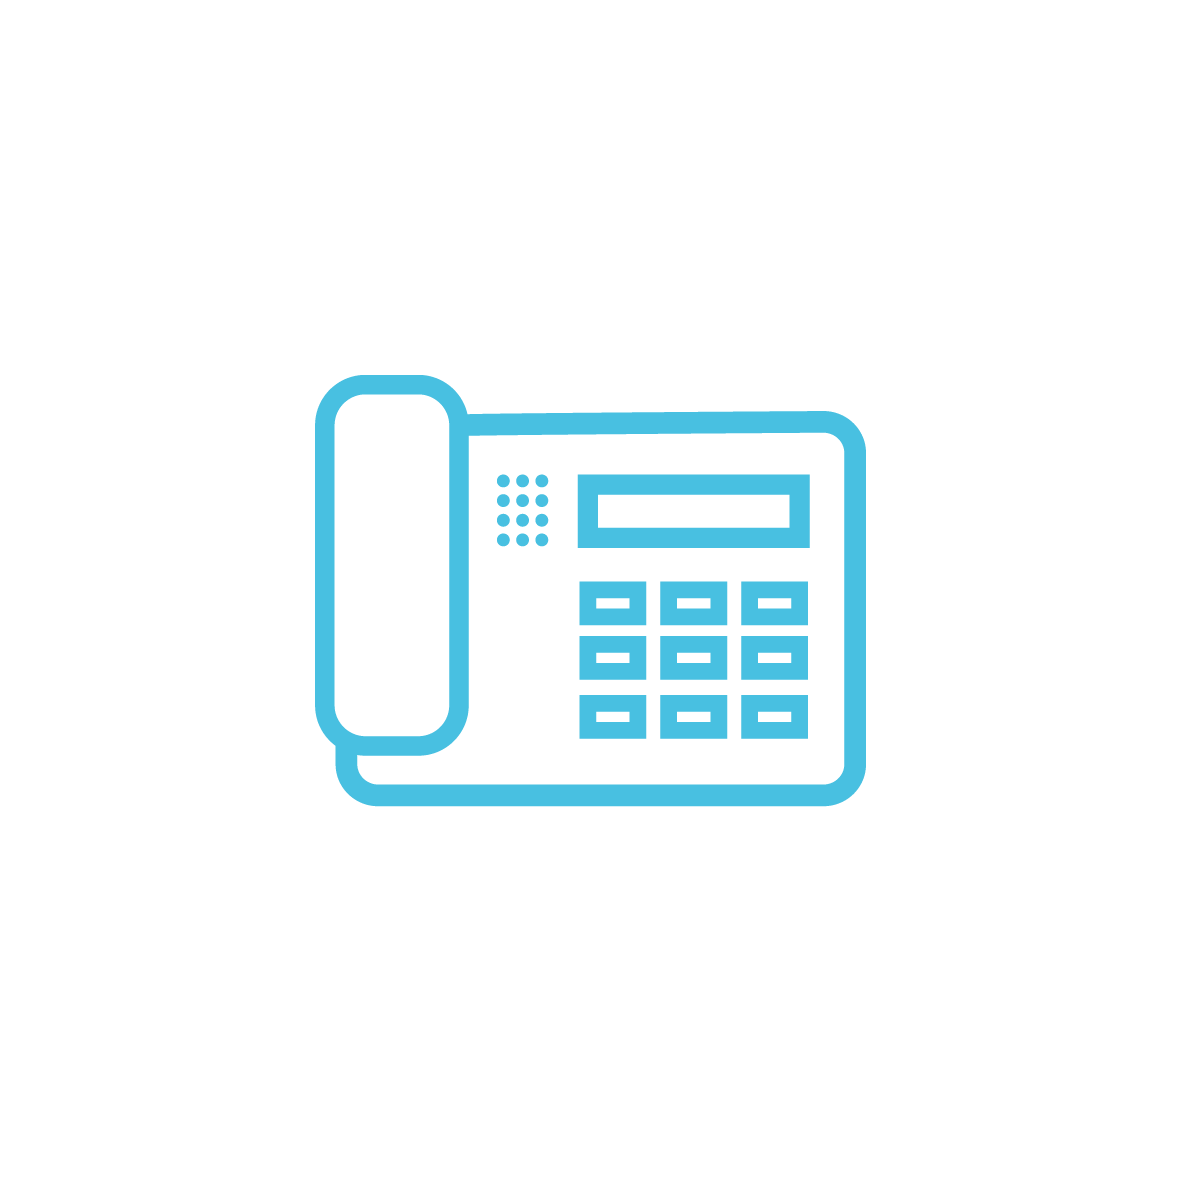 M297320-Communication-Solution-Icons-v2-LB-Desk-Phone